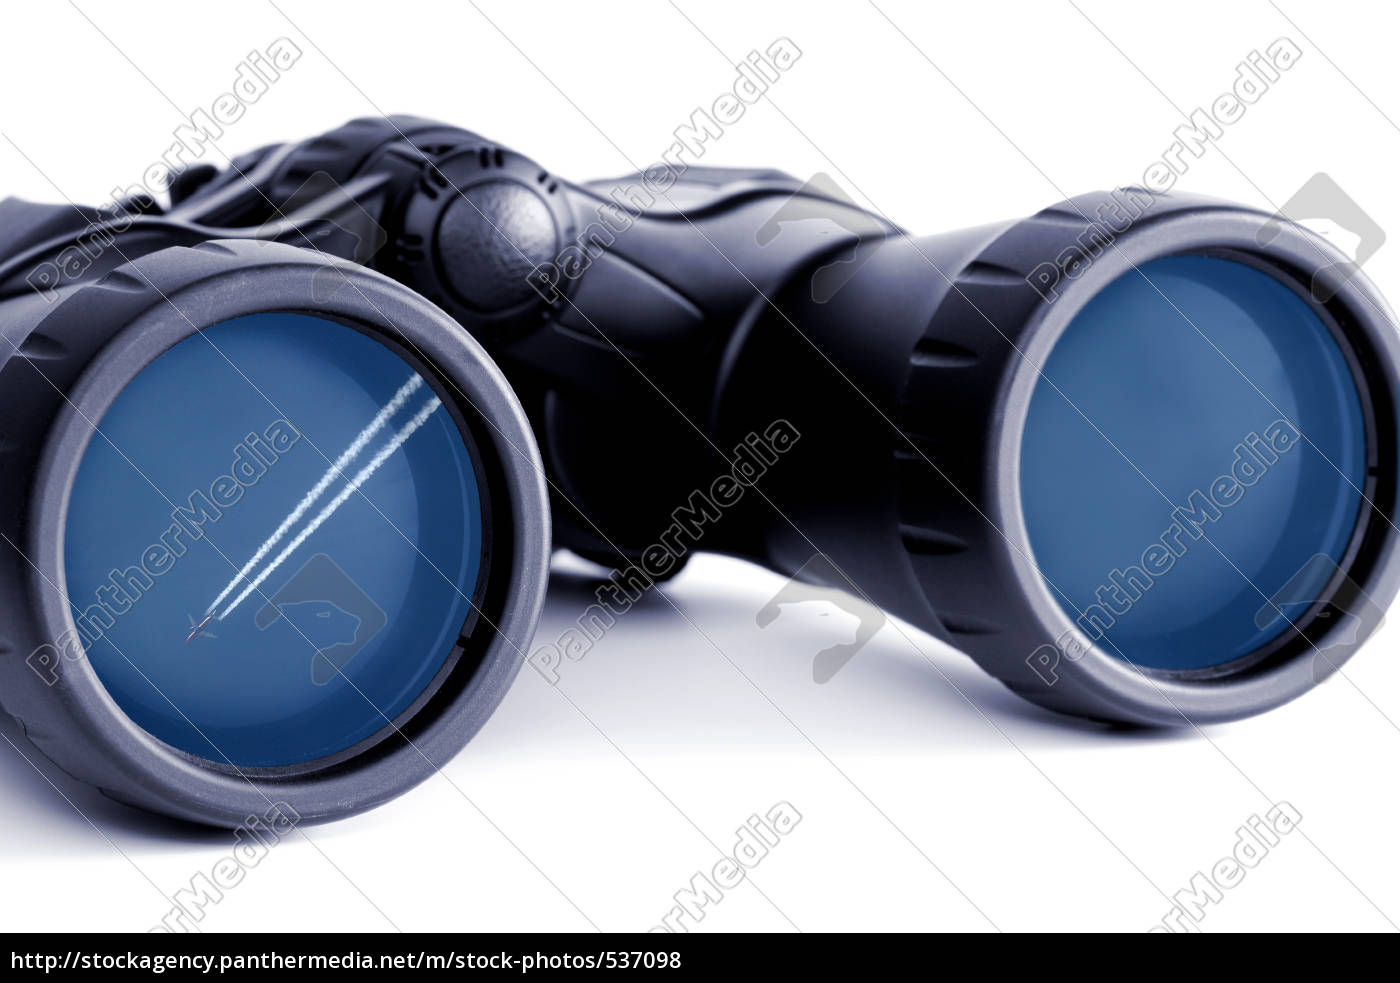 binoculars - 537098